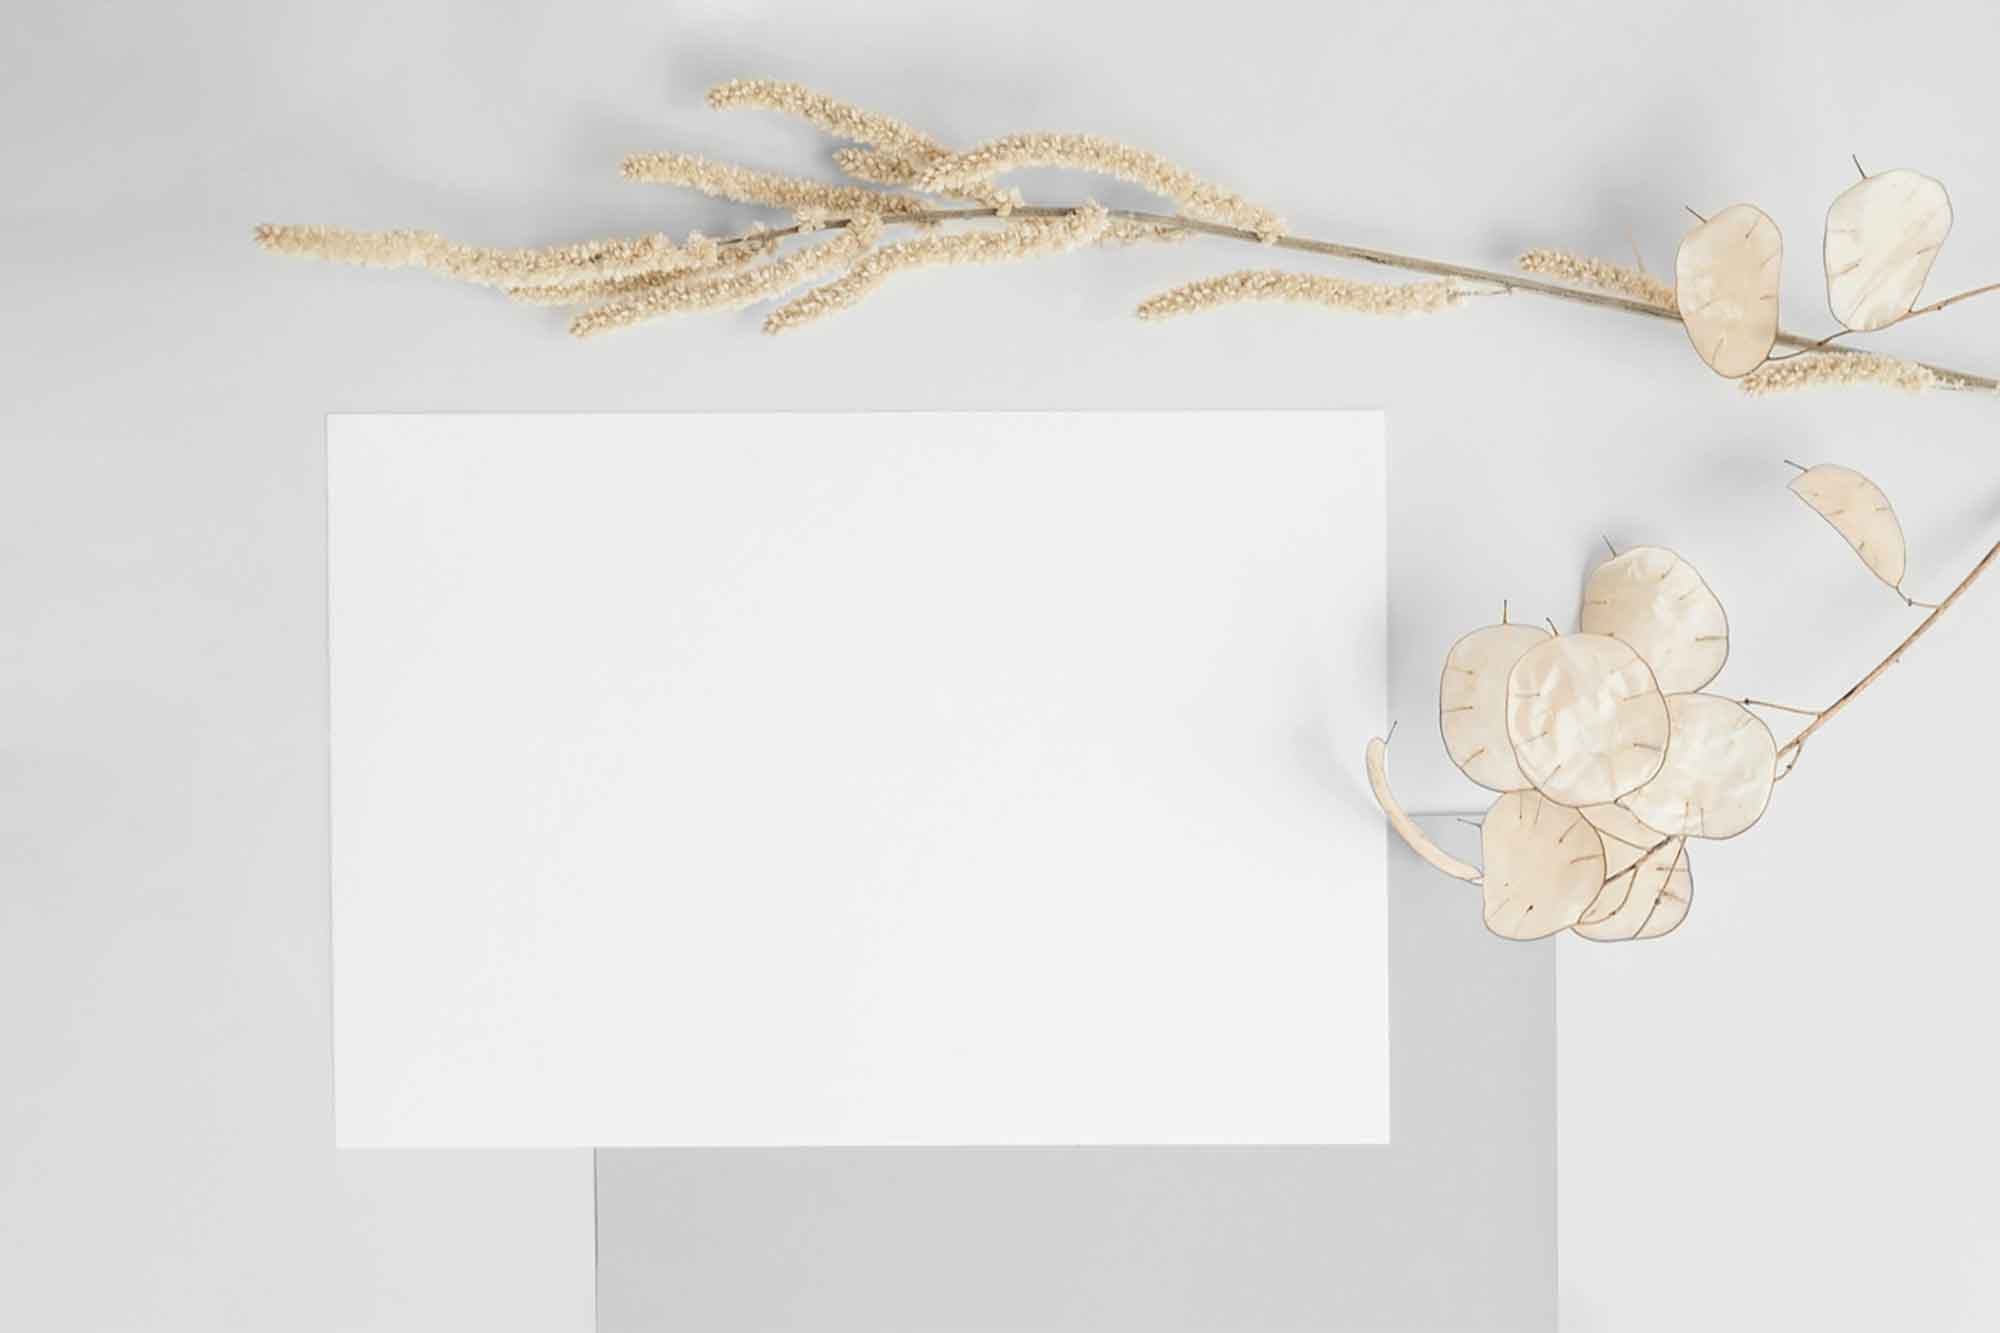 A5 Postcard with Envelope Mockup 2